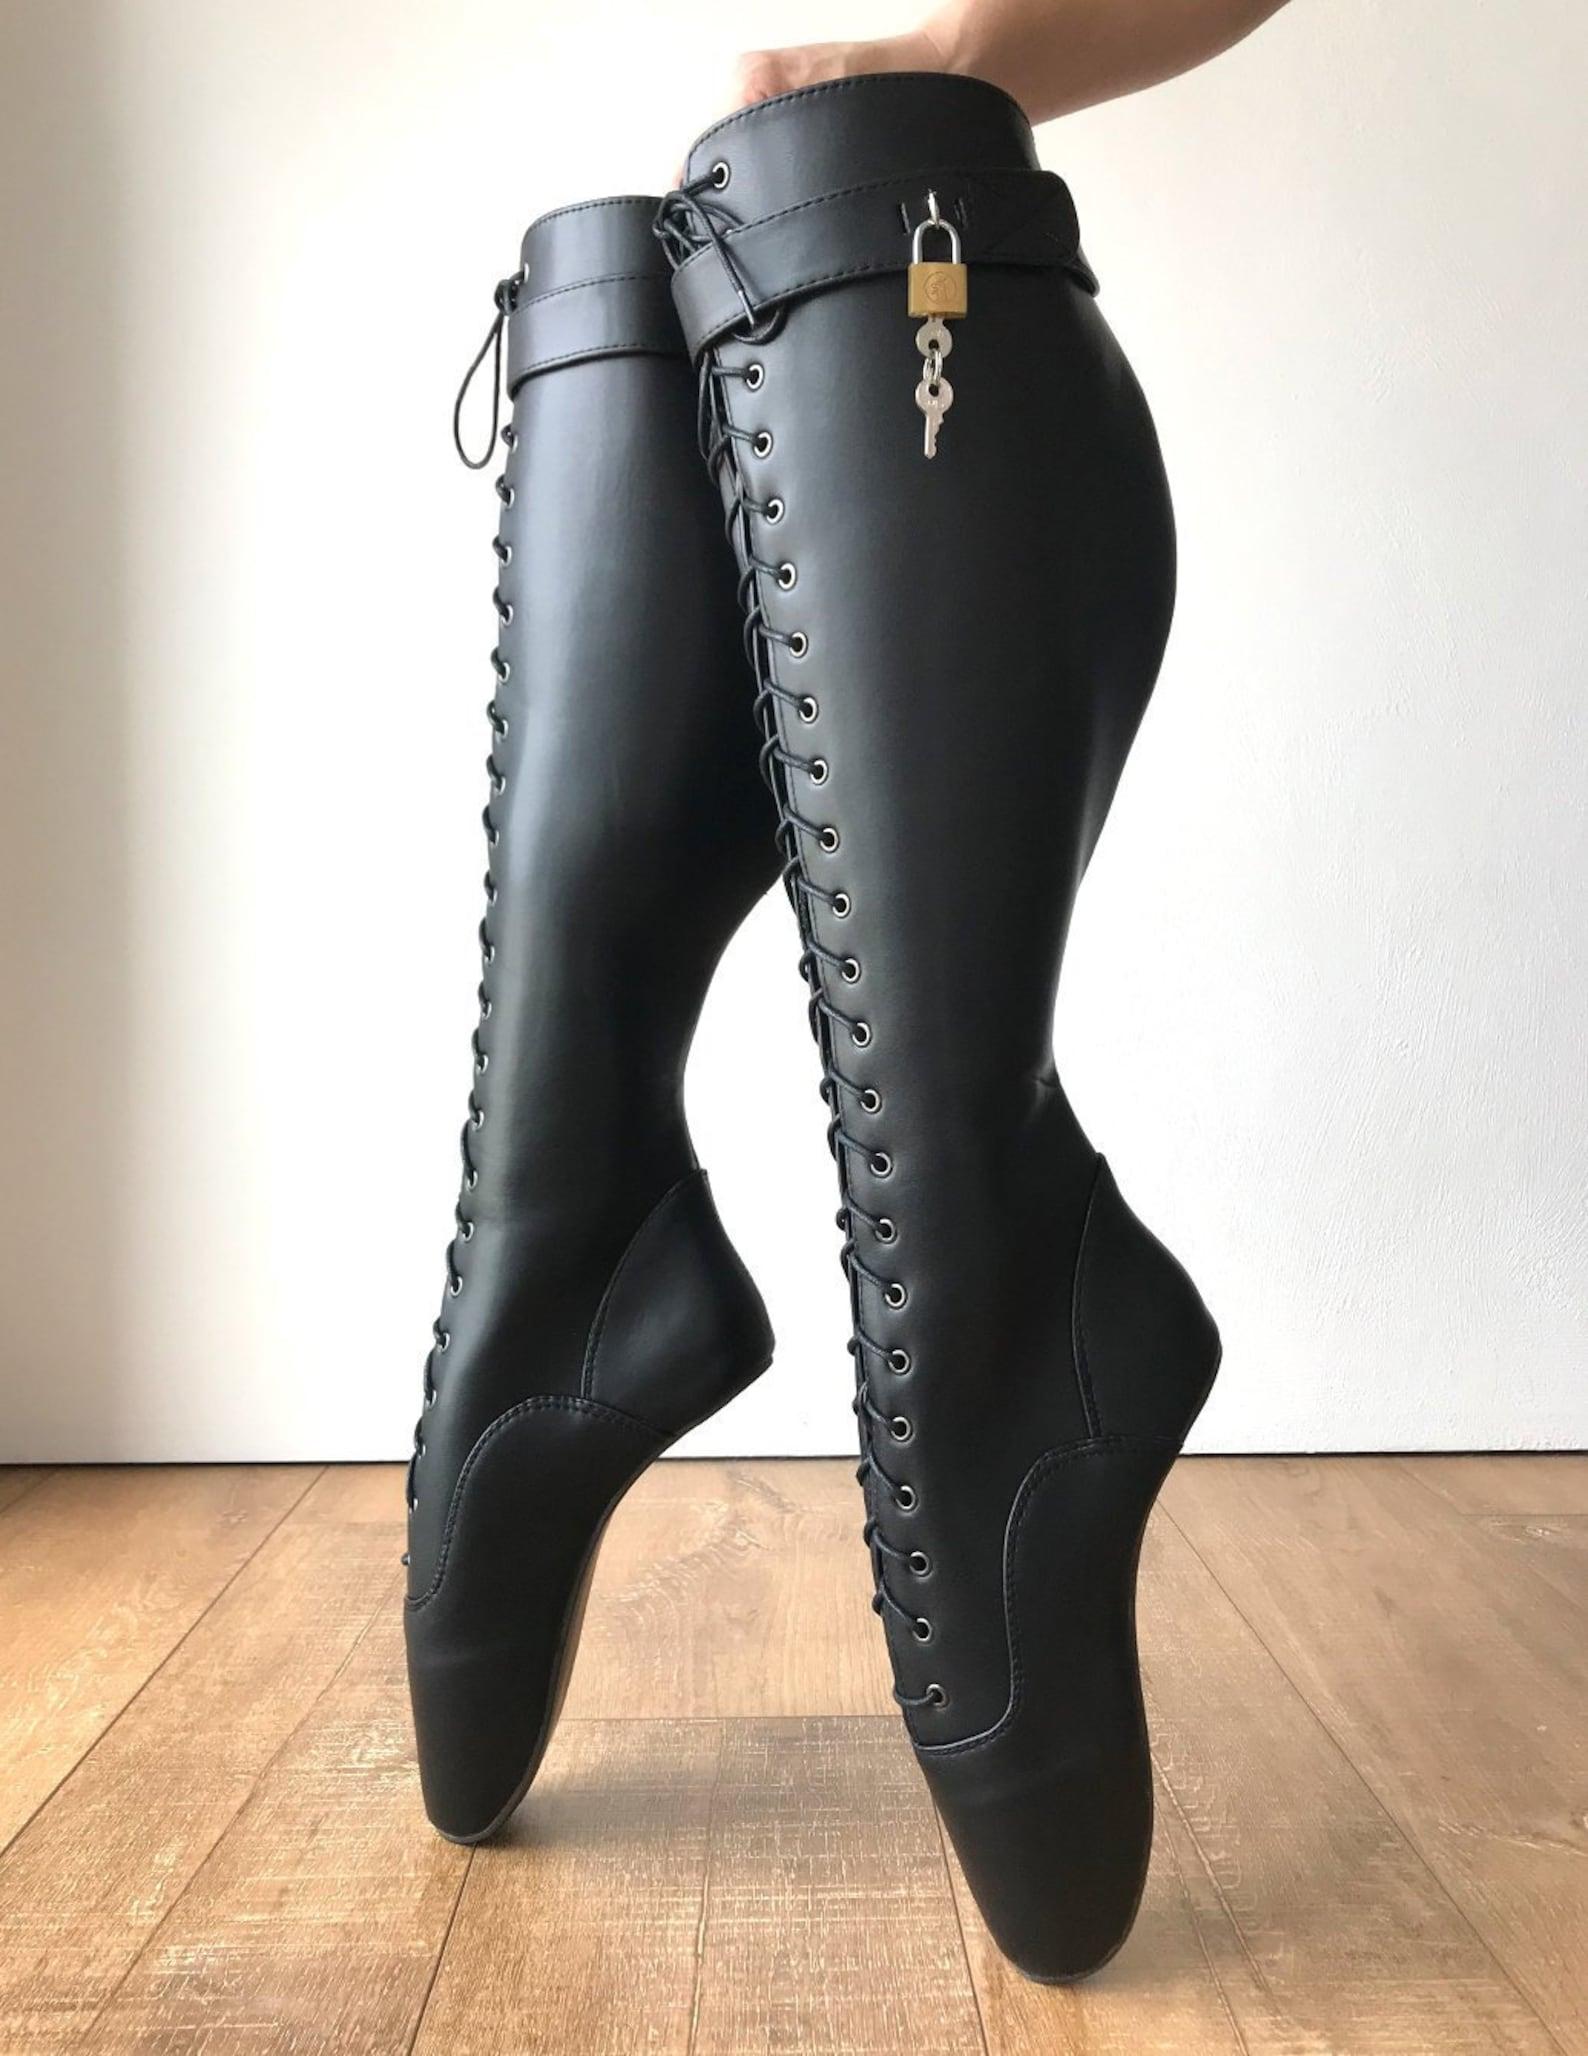 rtbu pfeiffer heelless lace up knee hi ballet strap padlock pain boots black matte